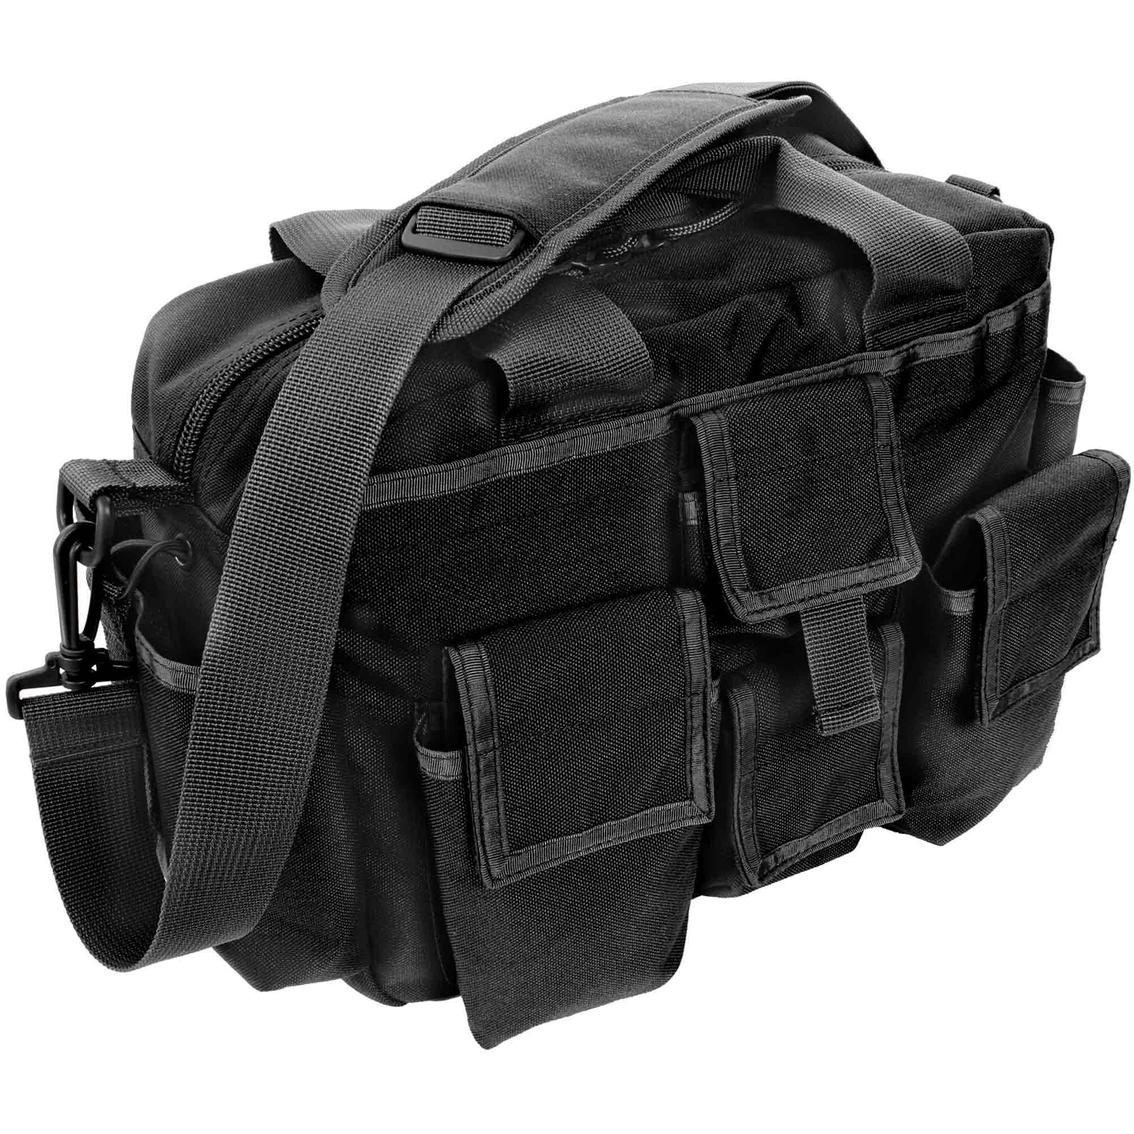 sandpiper of california small range bag luggage more. Black Bedroom Furniture Sets. Home Design Ideas